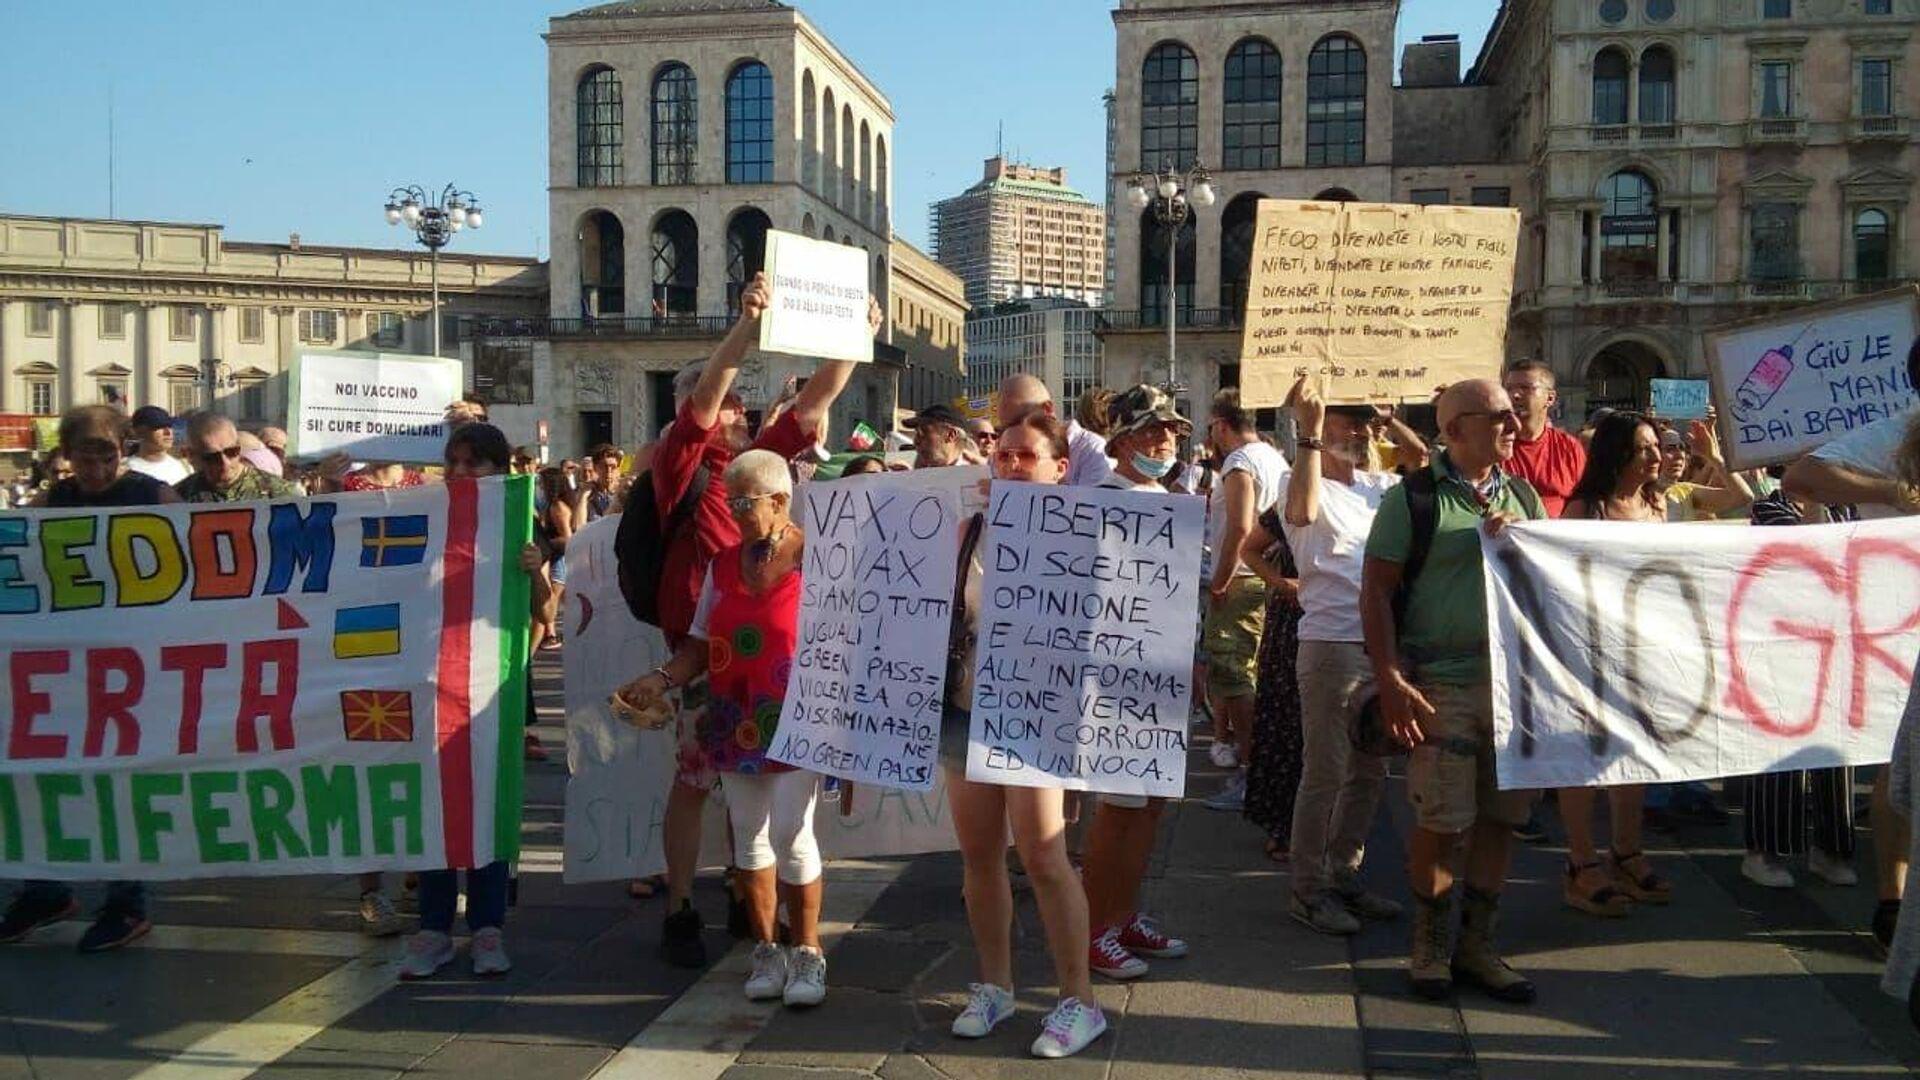 Manifestazione no Green pass a Milano  - Sputnik Italia, 1920, 31.08.2021